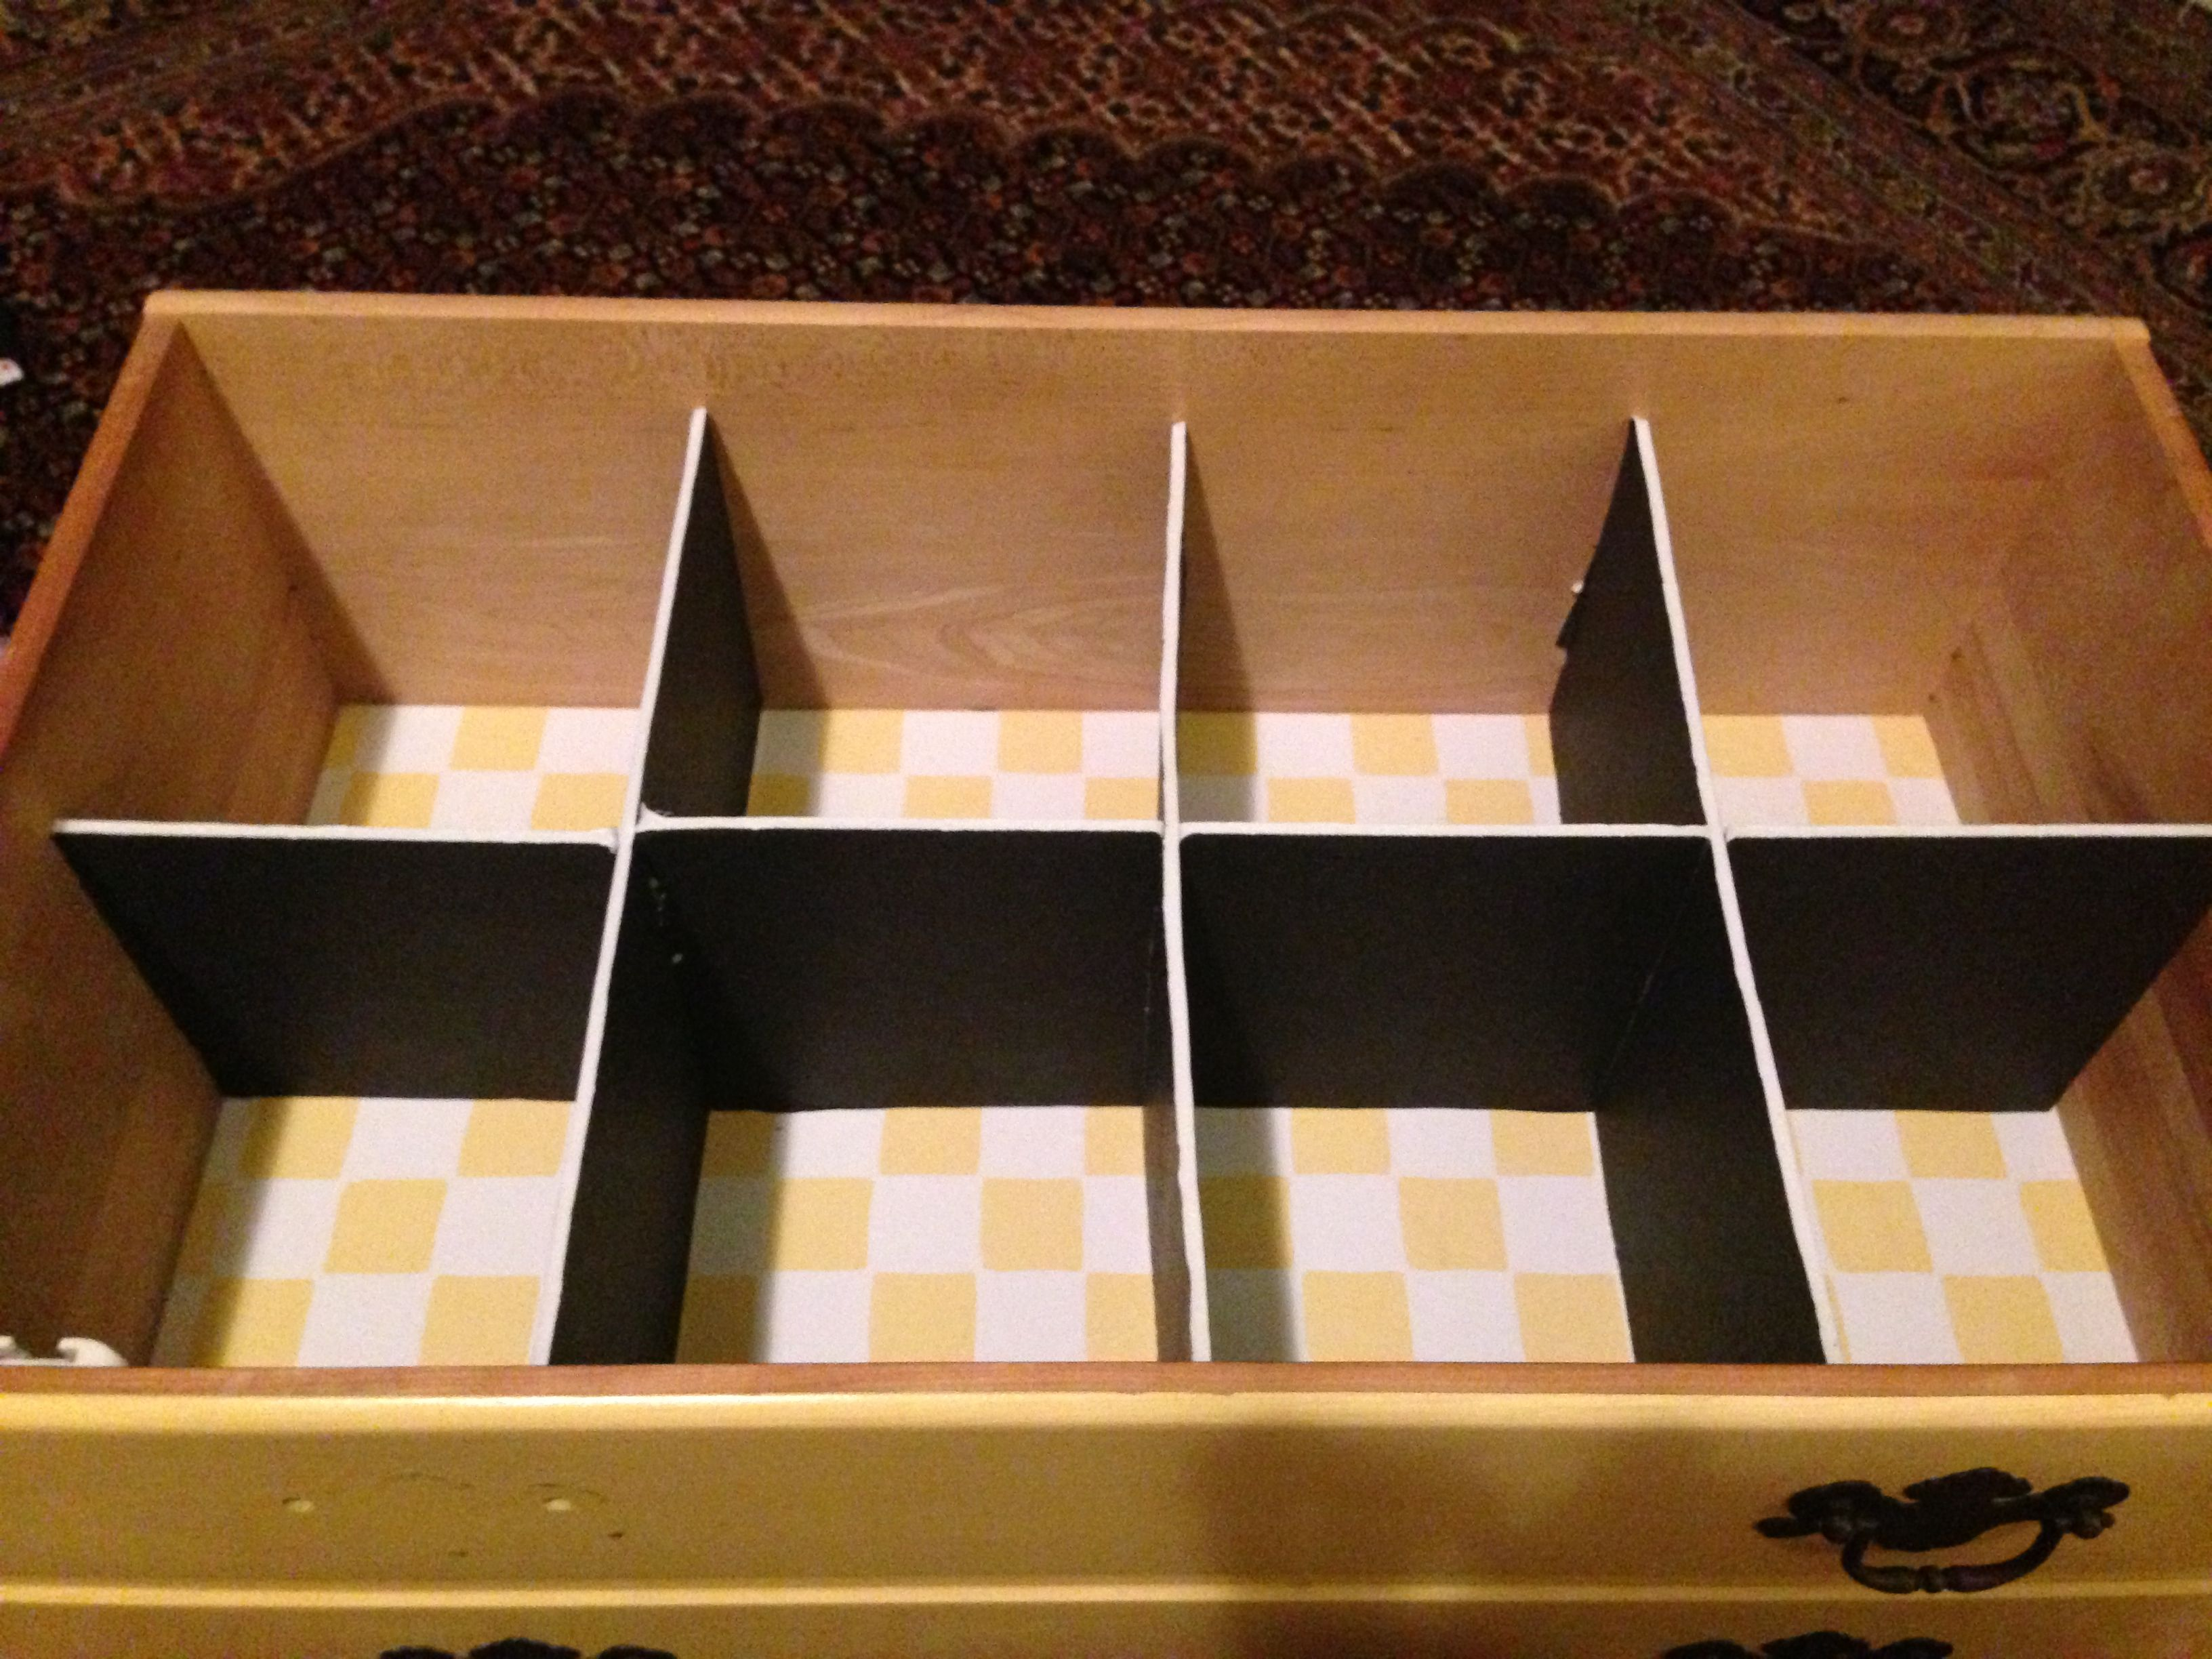 DIY Drawer Dividers - foam board $1 each at dollar store ...